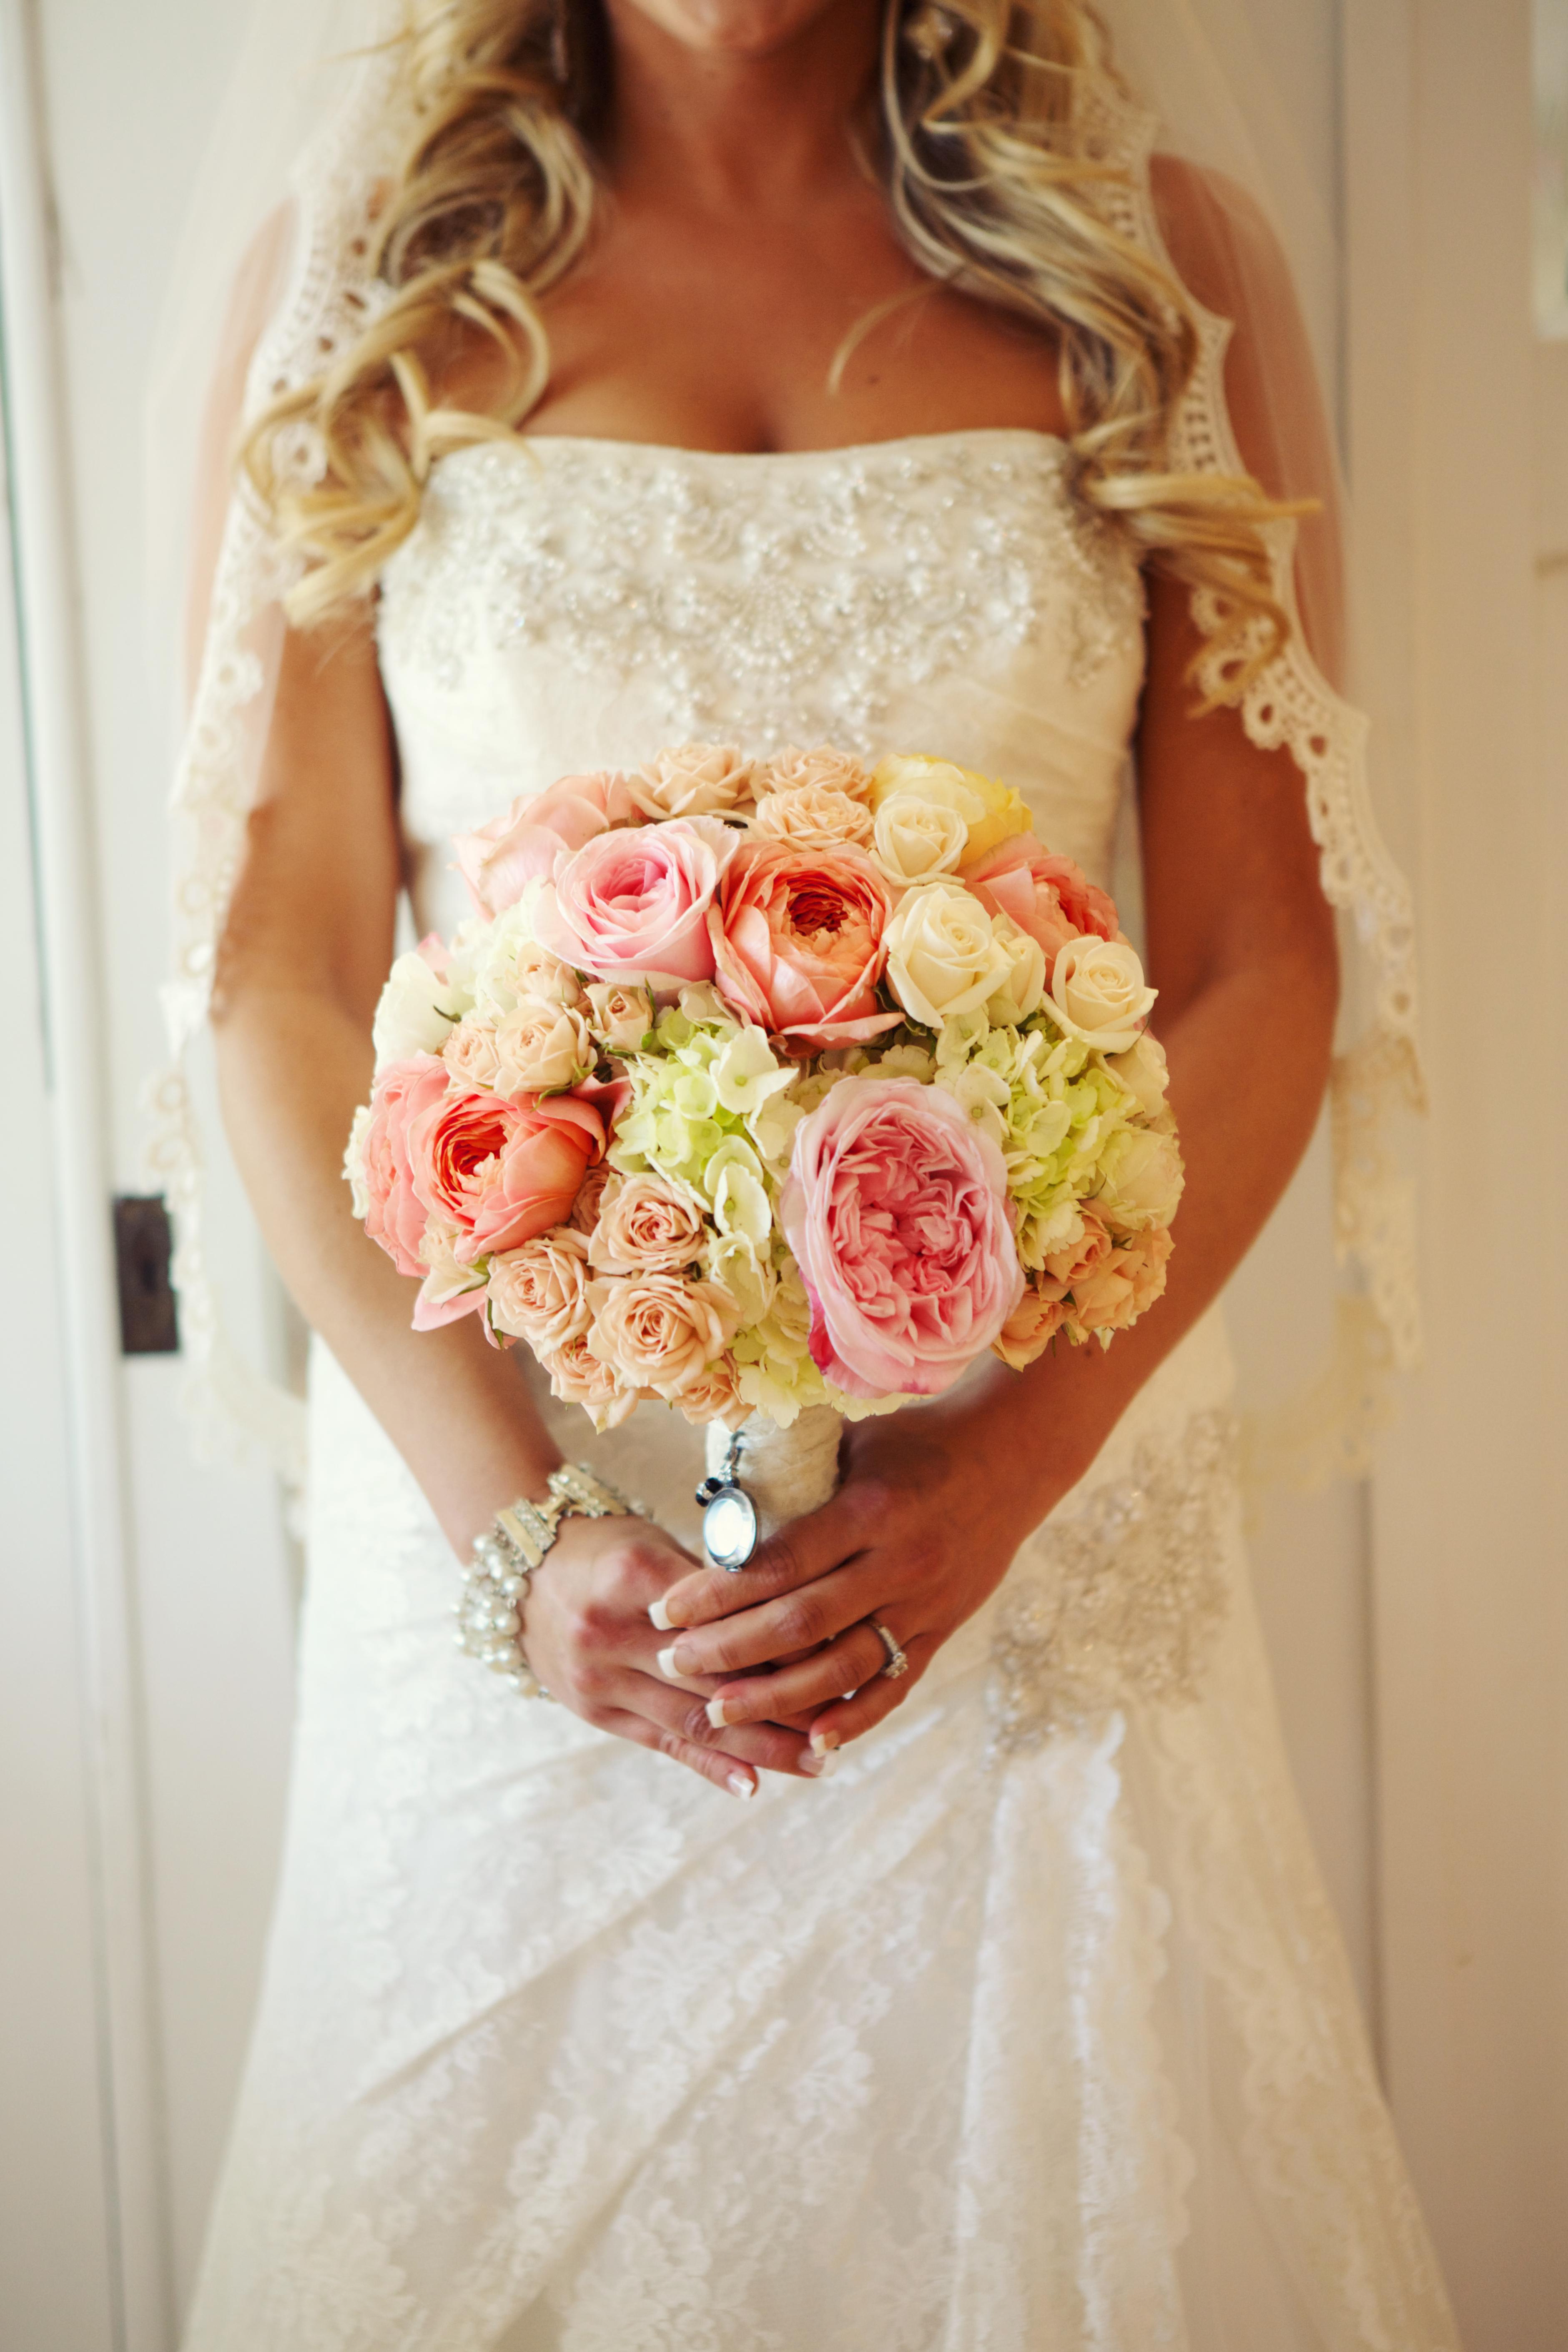 Megan & Aaron's Wedding 5.25.13 143